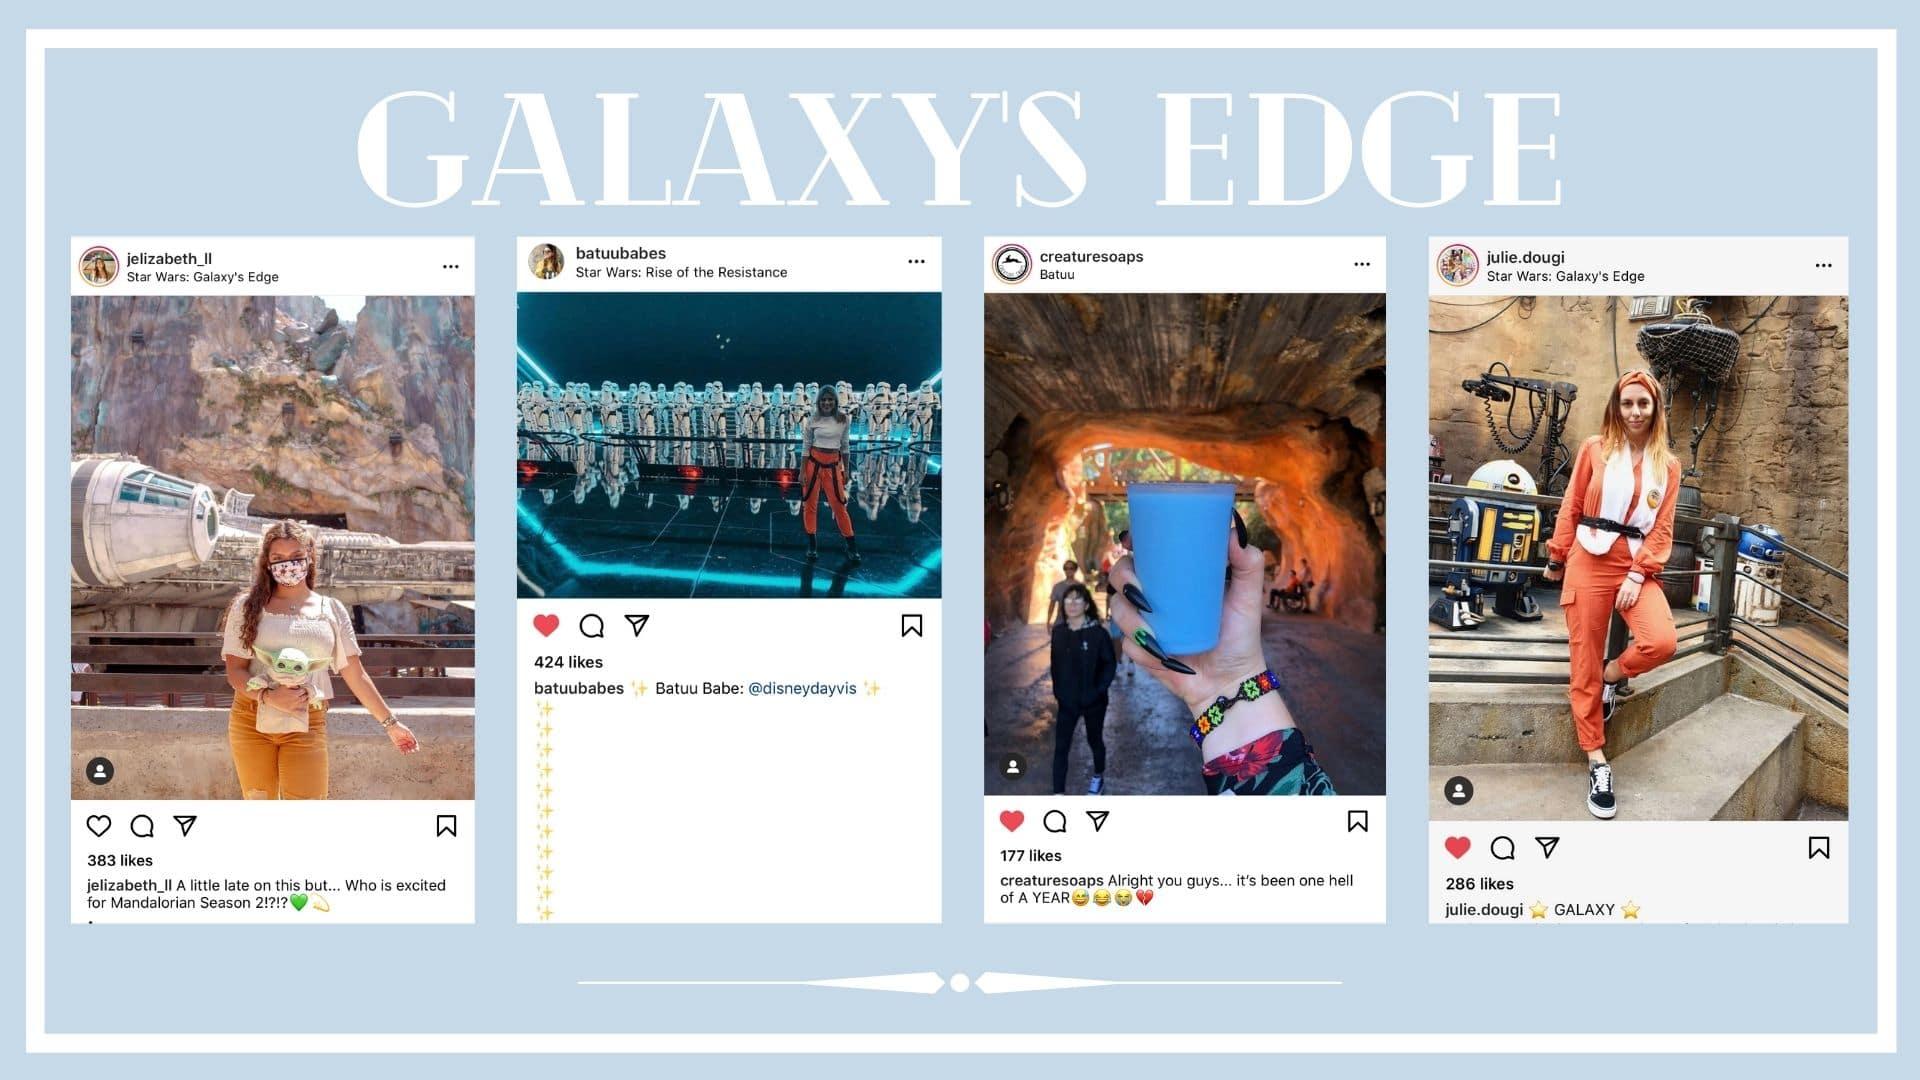 Instagram photos of Galaxy's Edge in Disneyland